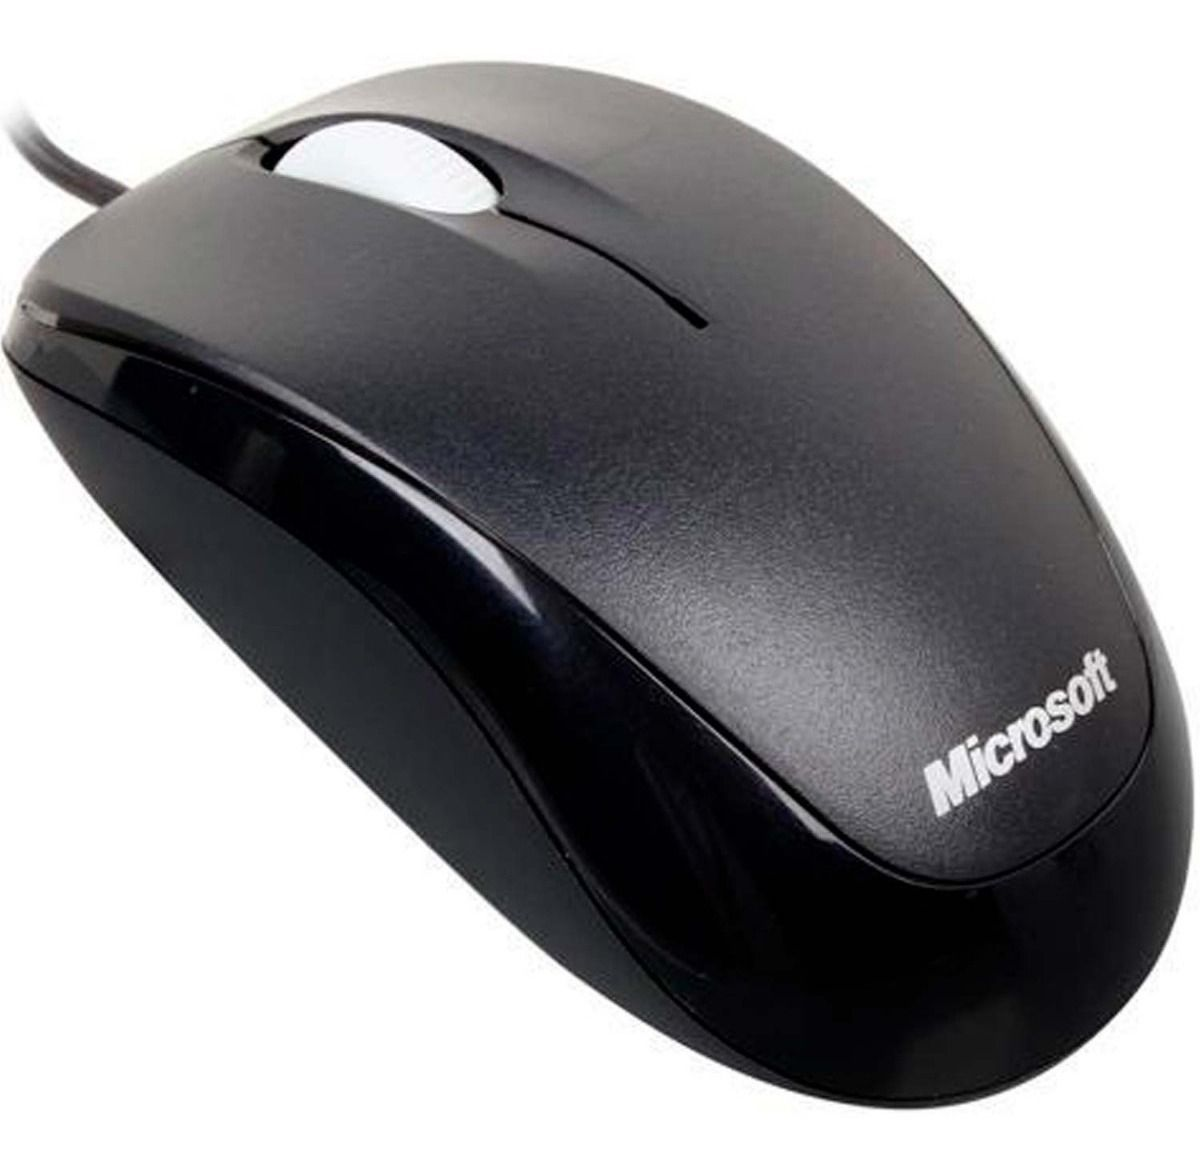 Mouse optico alàmbrico compact 500 Microsoft U81-00010